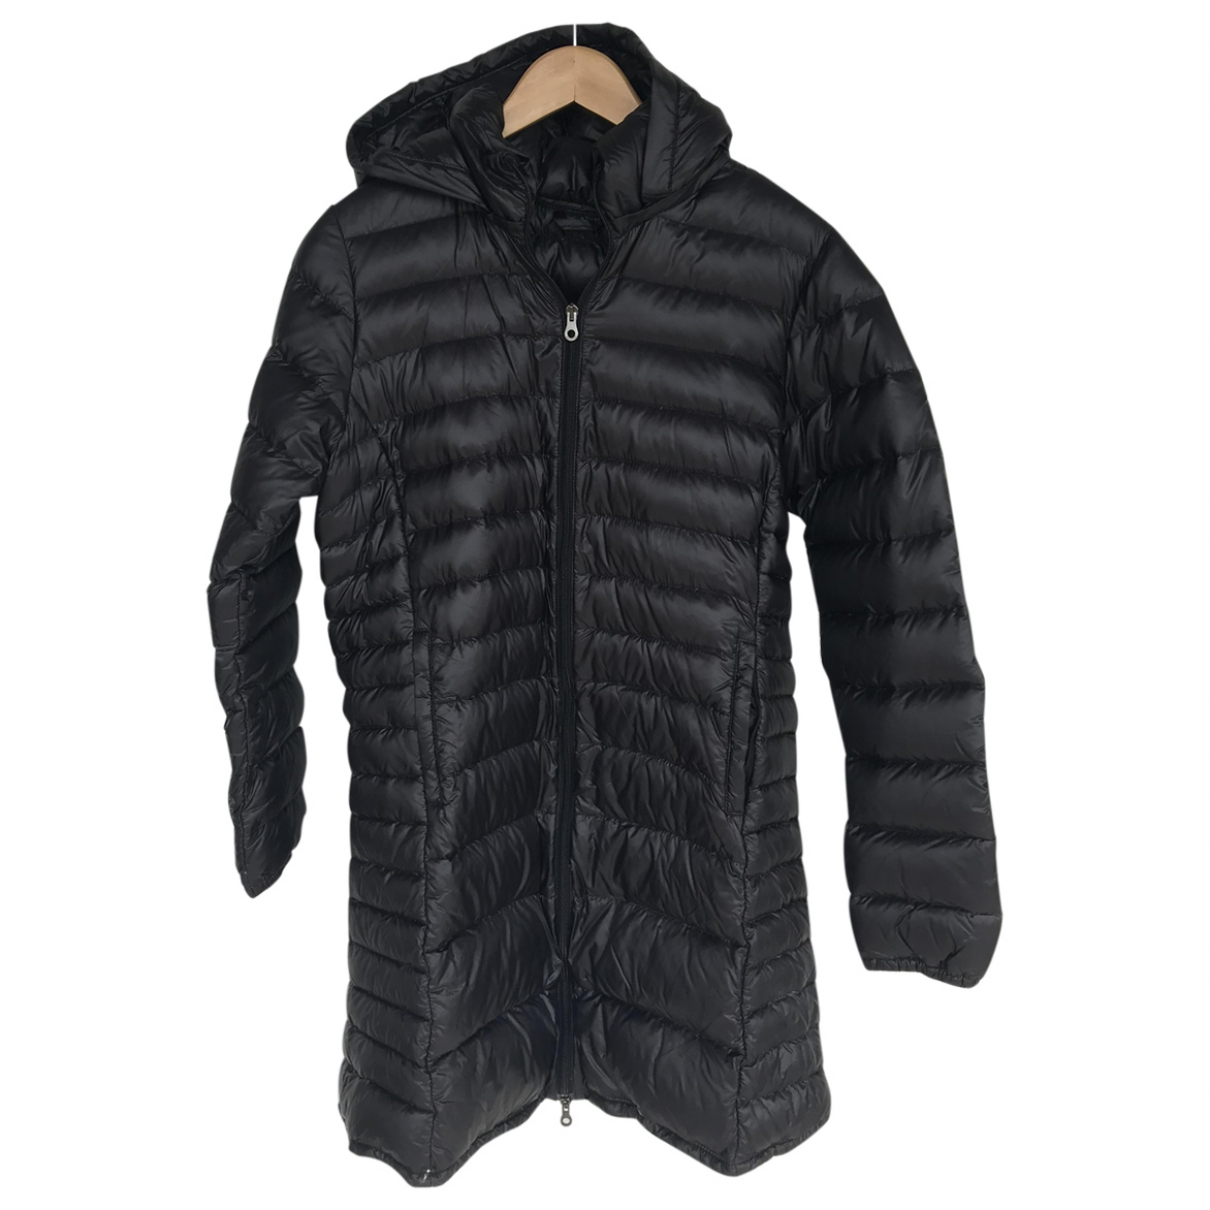 Duvetica \N Black coat for Women 48 IT